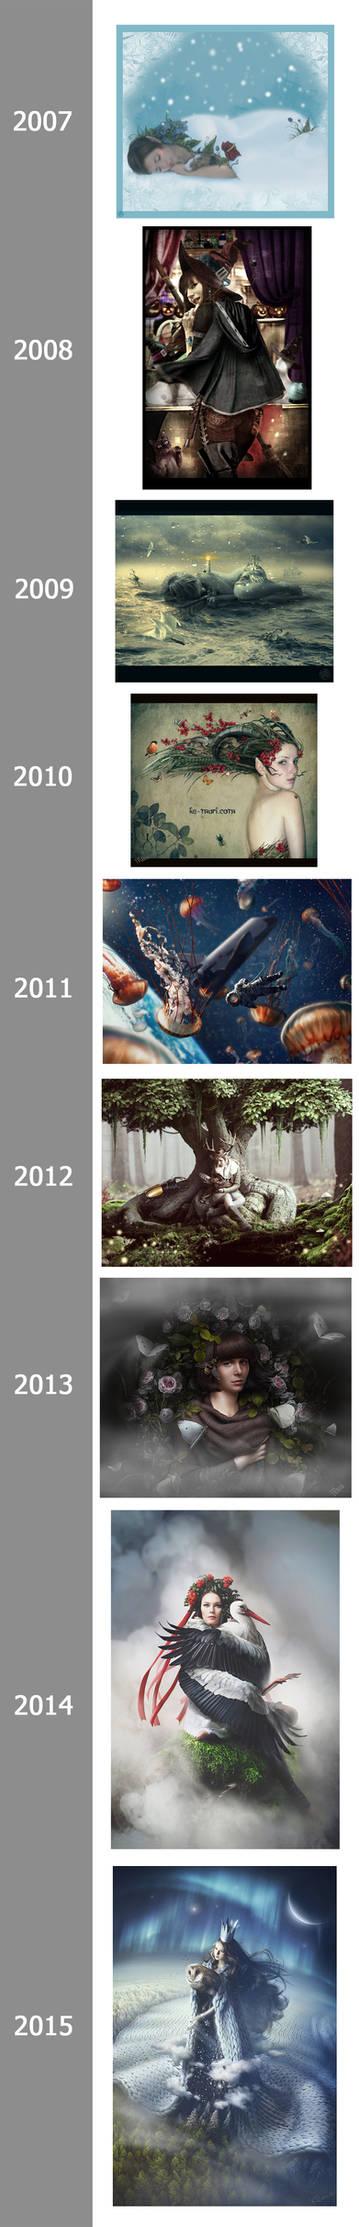 2007-2015 evolution